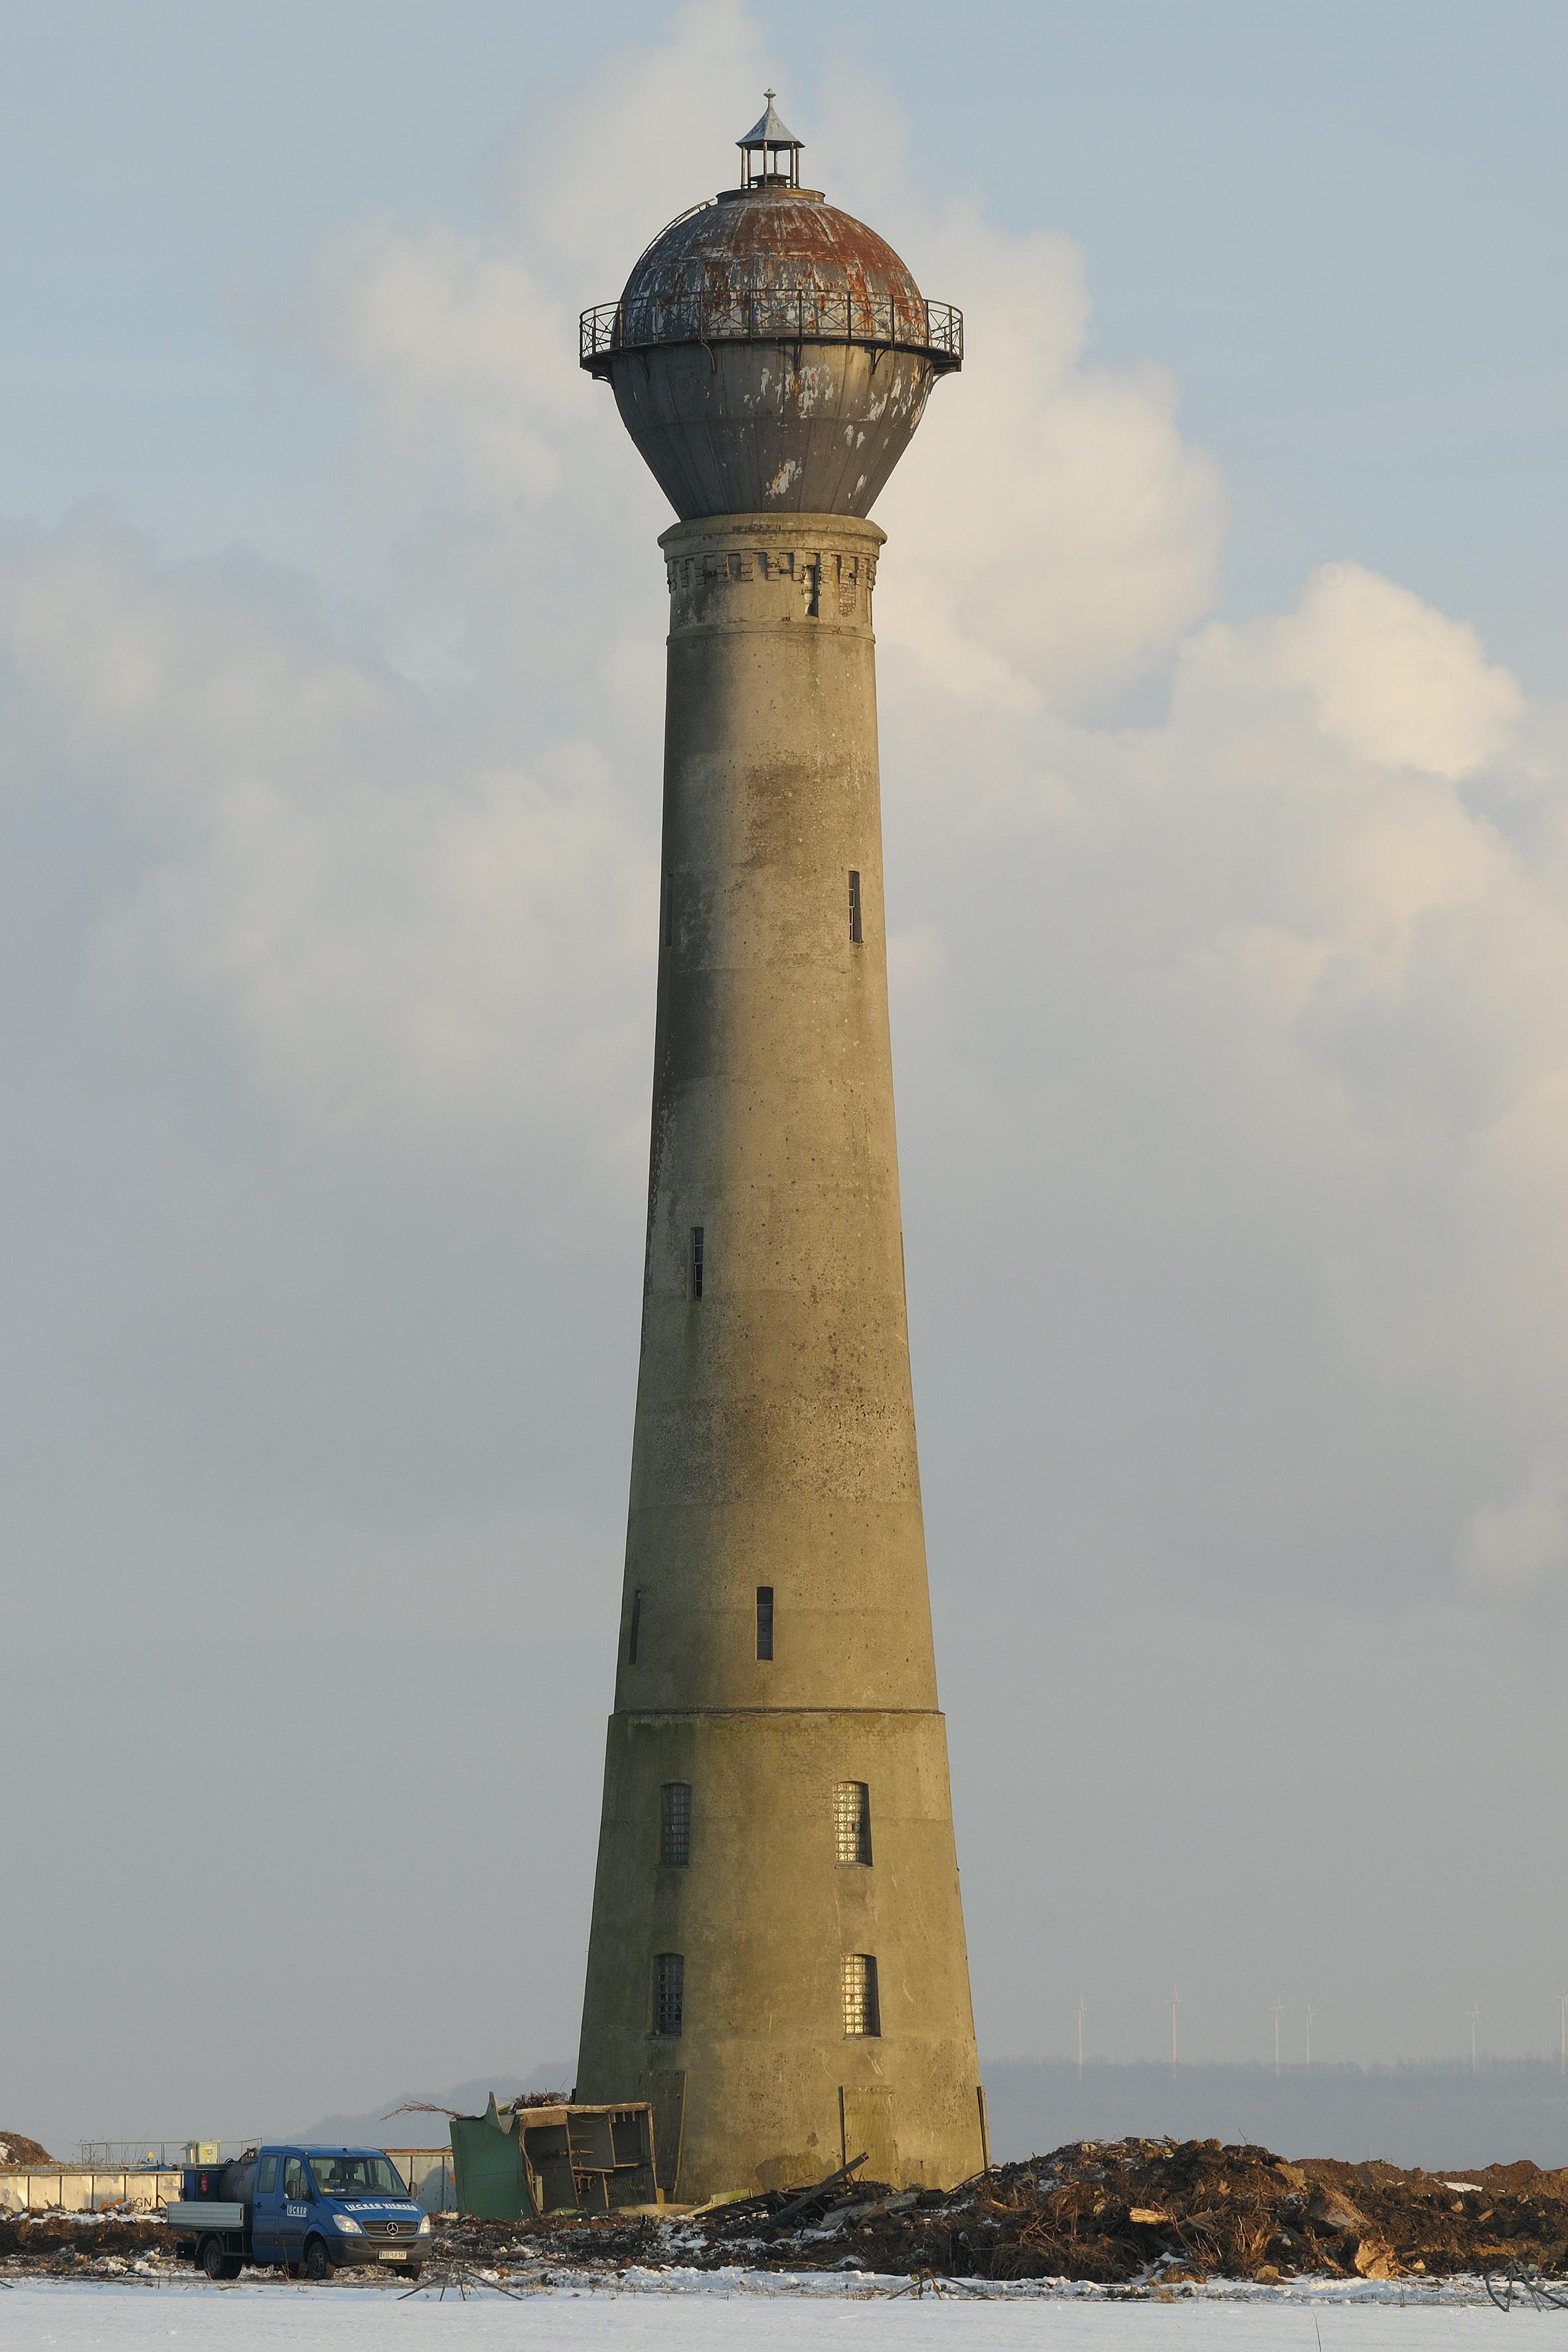 Wasserturm Holz